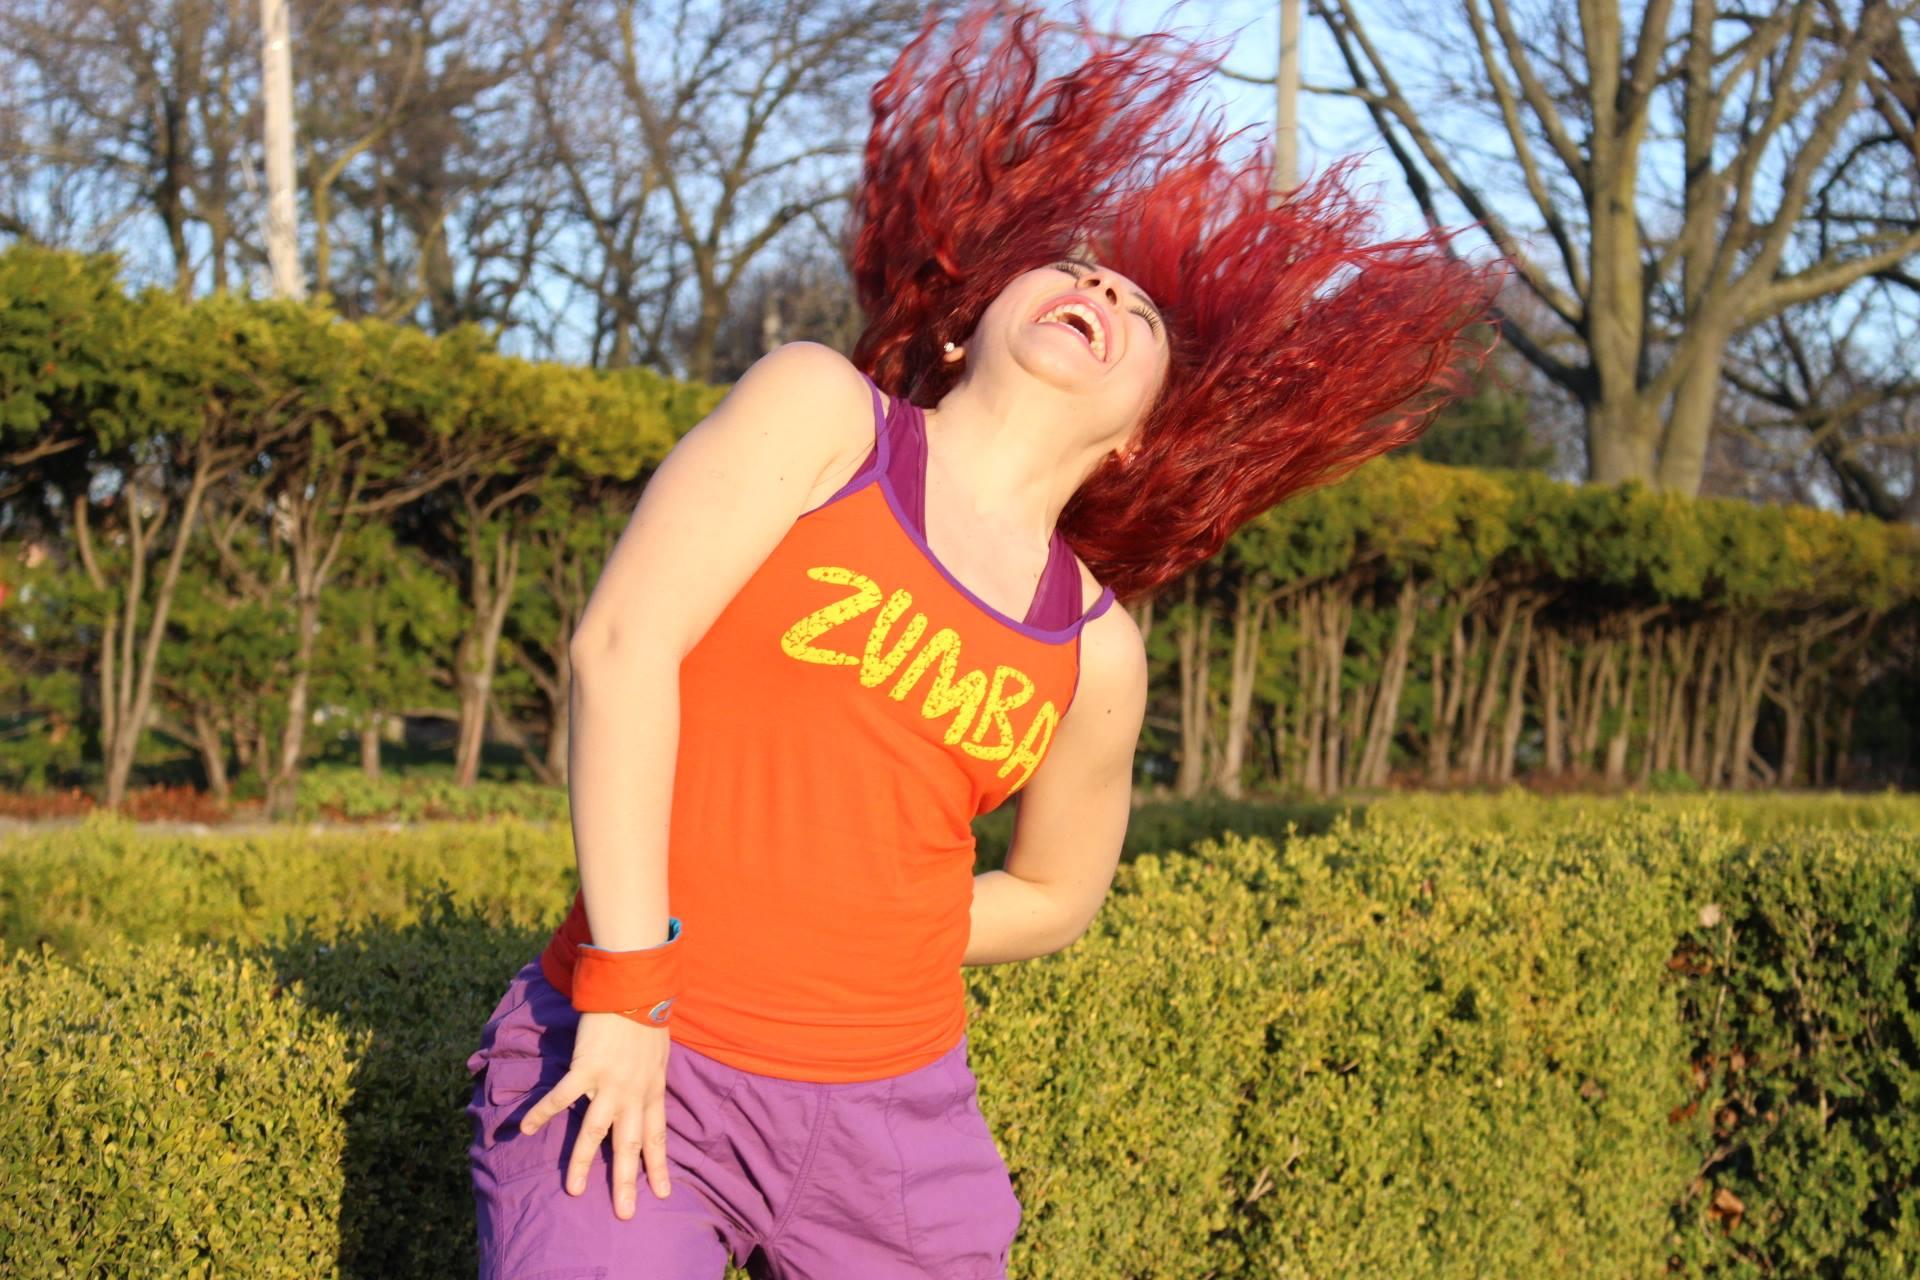 Zumba Dance Elizabeth Bravo